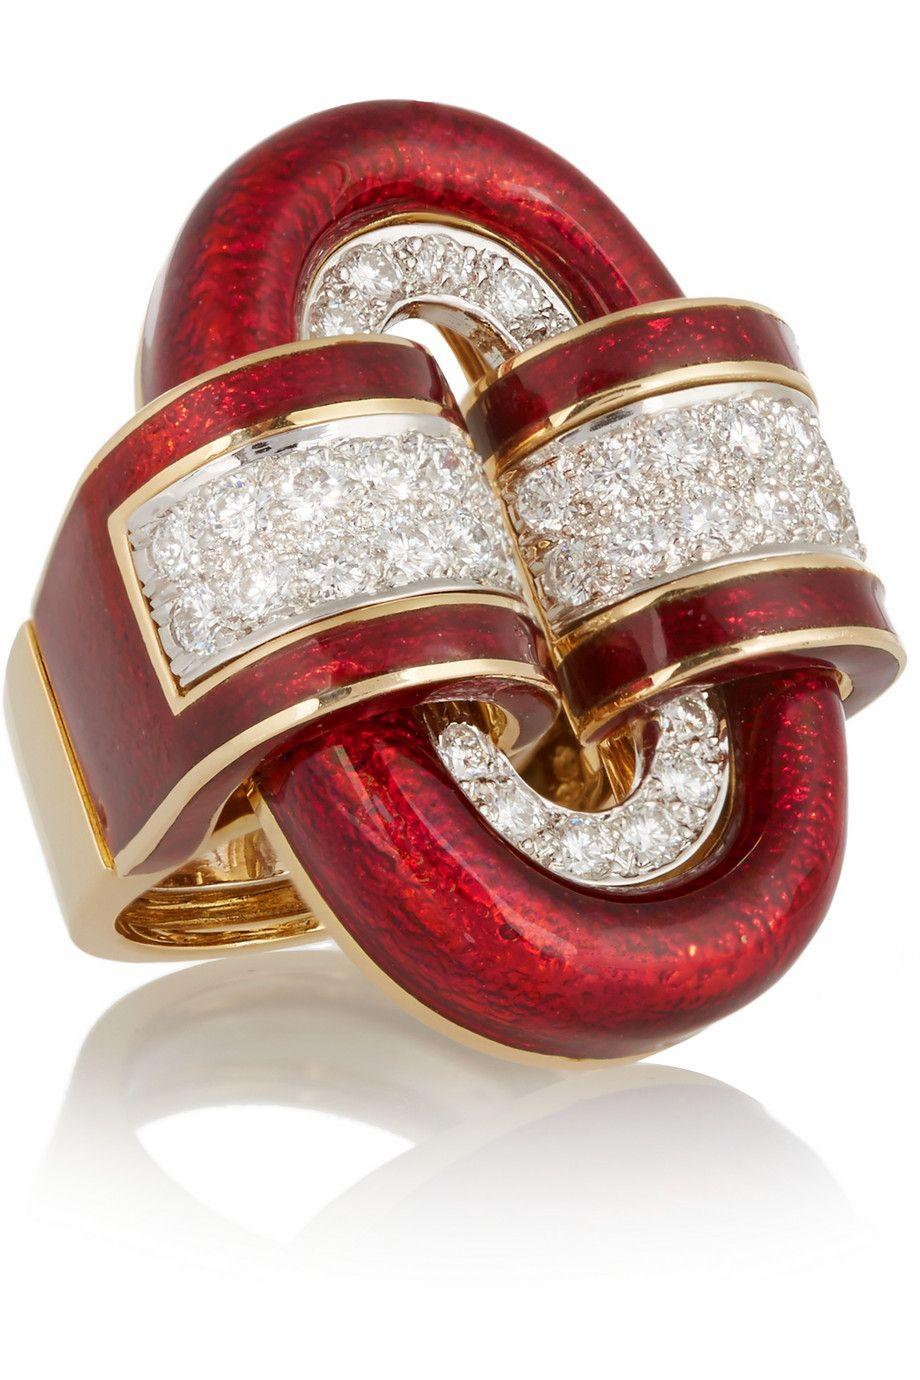 David Webb | 18-karat gold, platinum, diamond and enamel ring.